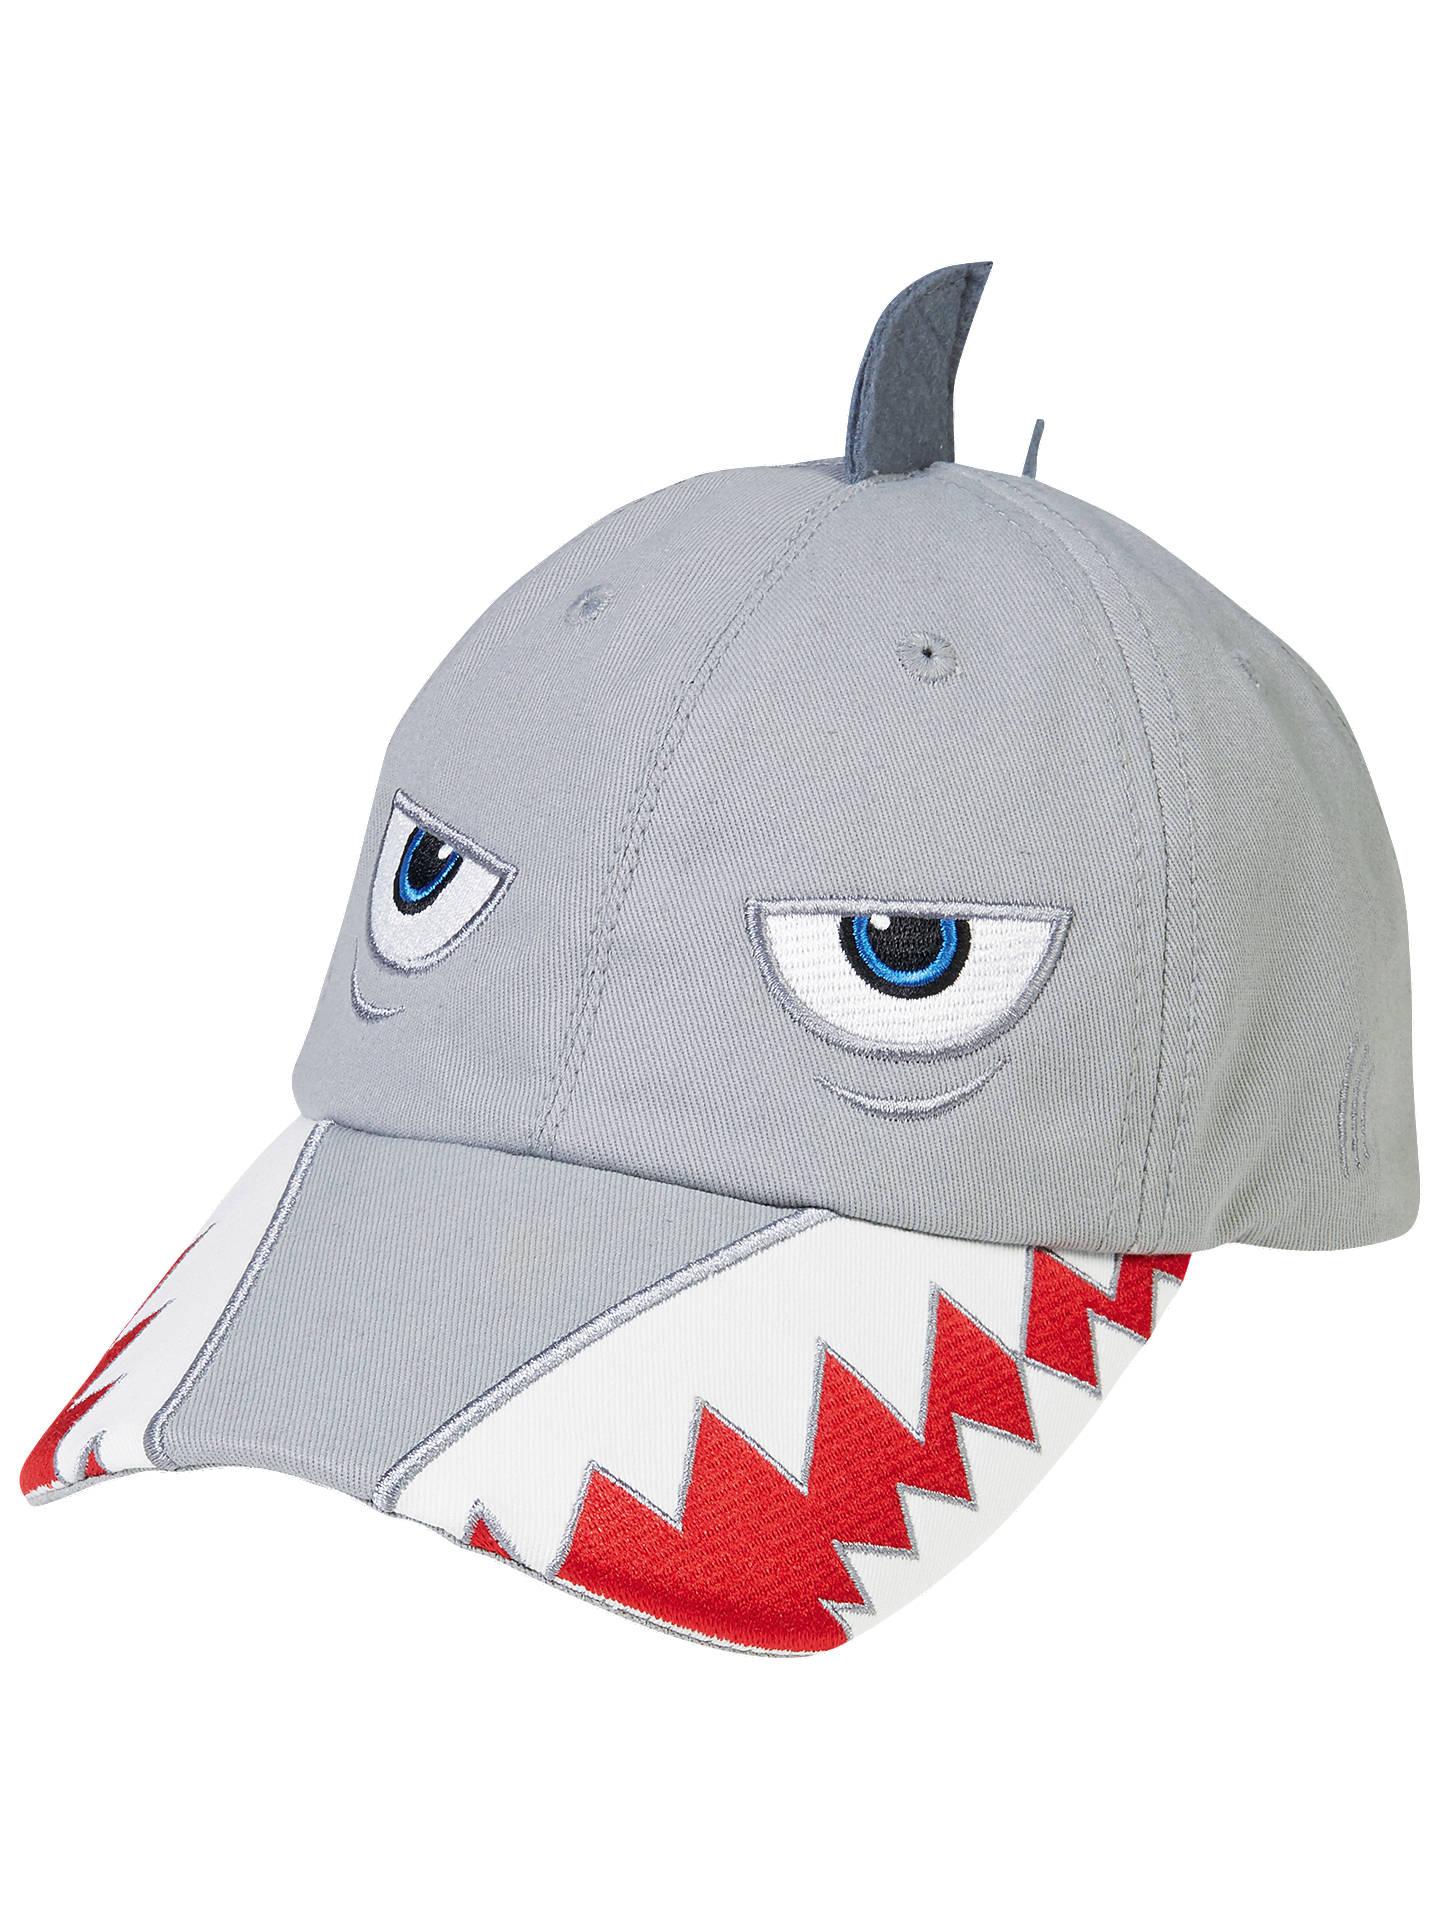 b124c5bd1a7f0 Buy Fat Face Children s Shark Cap Hat